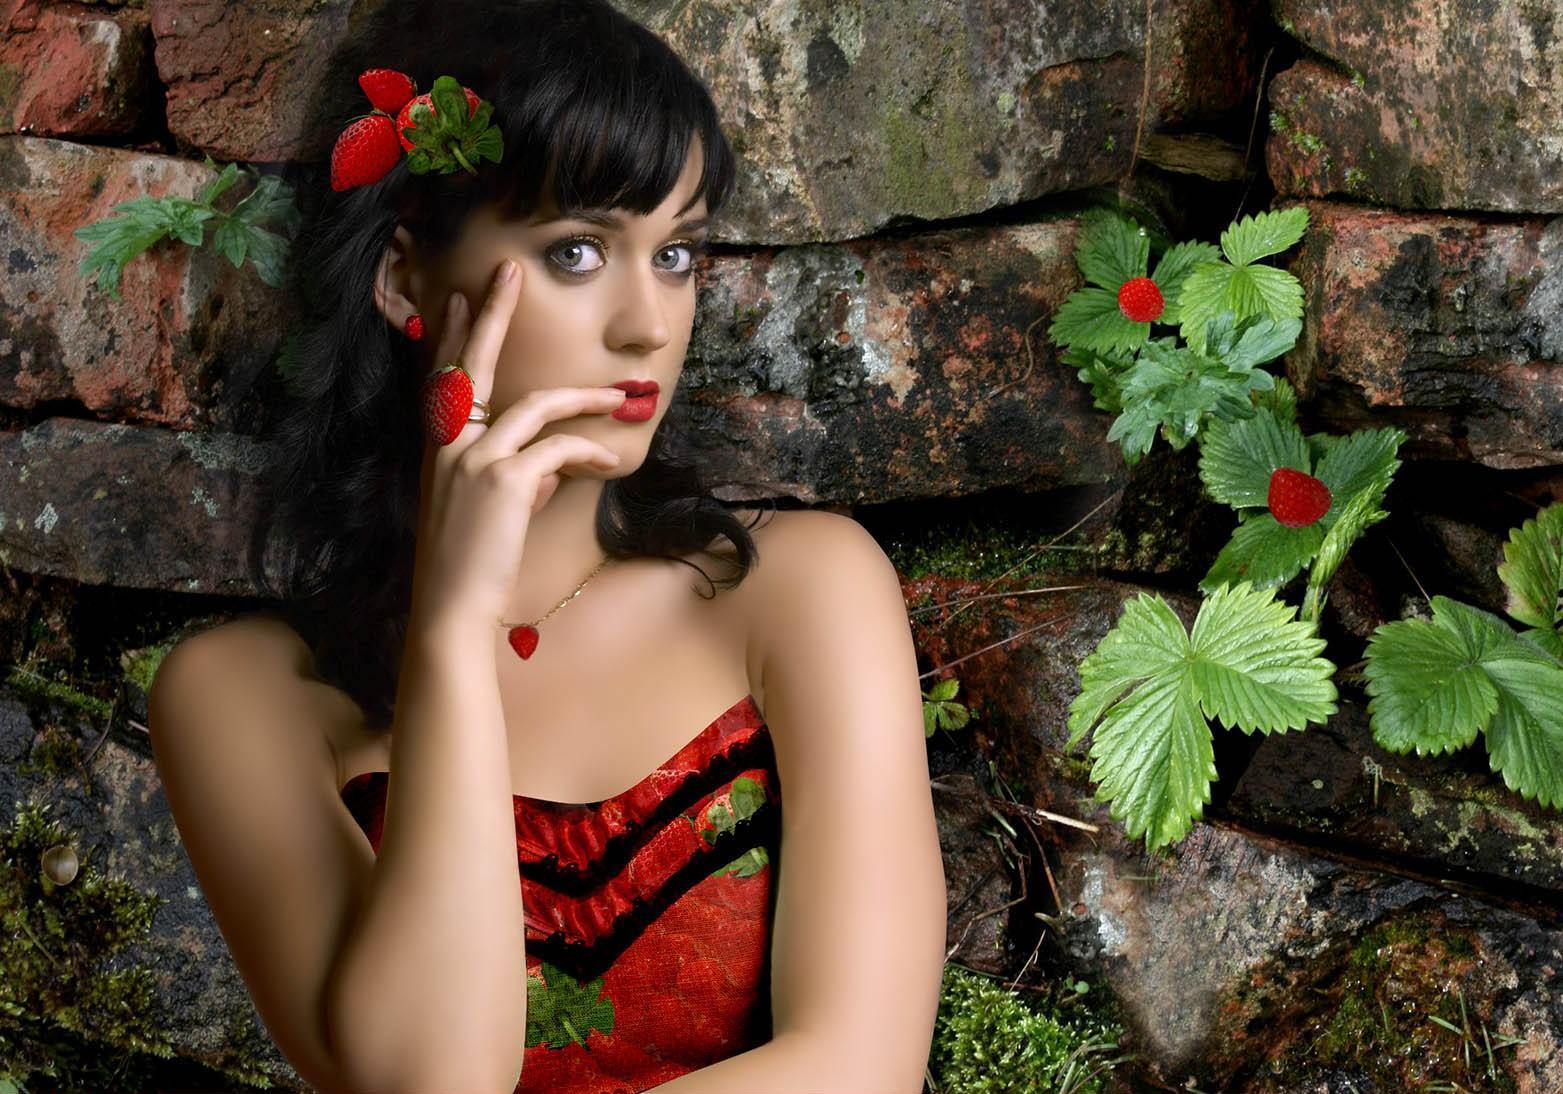 http://3.bp.blogspot.com/-C-Eai5HZNt0/TvRVxTaHQBI/AAAAAAAAL0A/LQLiUTEYjKM/s1600/ketty_perry_Red_lips_wallpapers.jpg